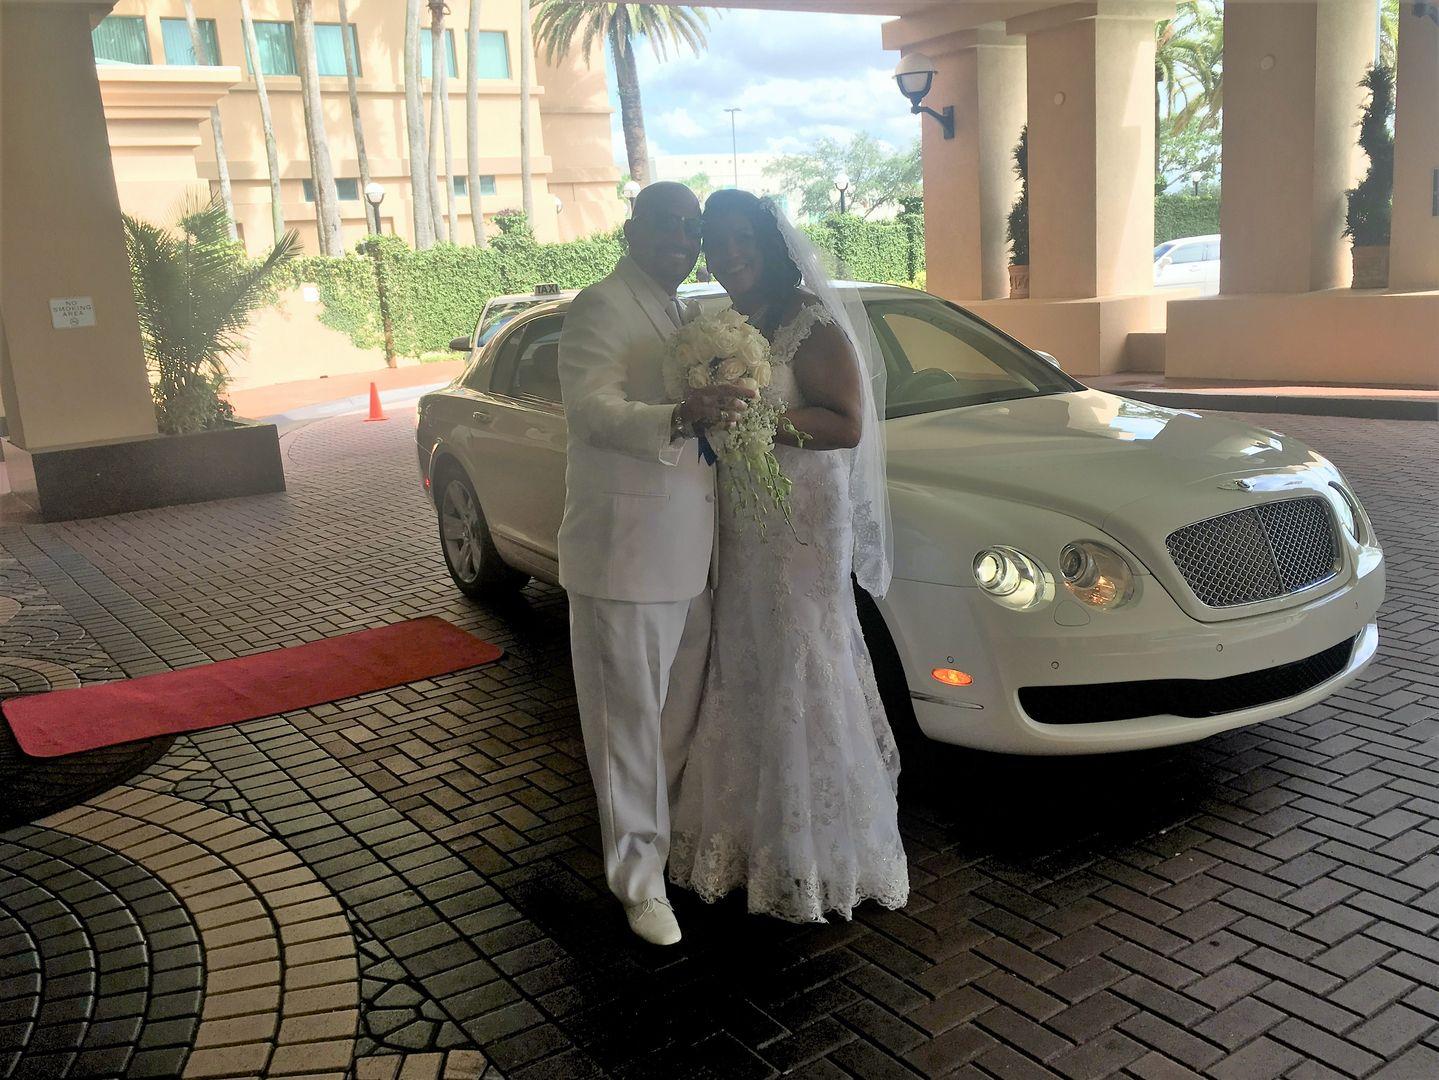 Bentley Wedding Car Rental At Orlando Wedding Cars Limousines Are Also Wedding Car Bentley Orlando Wedding